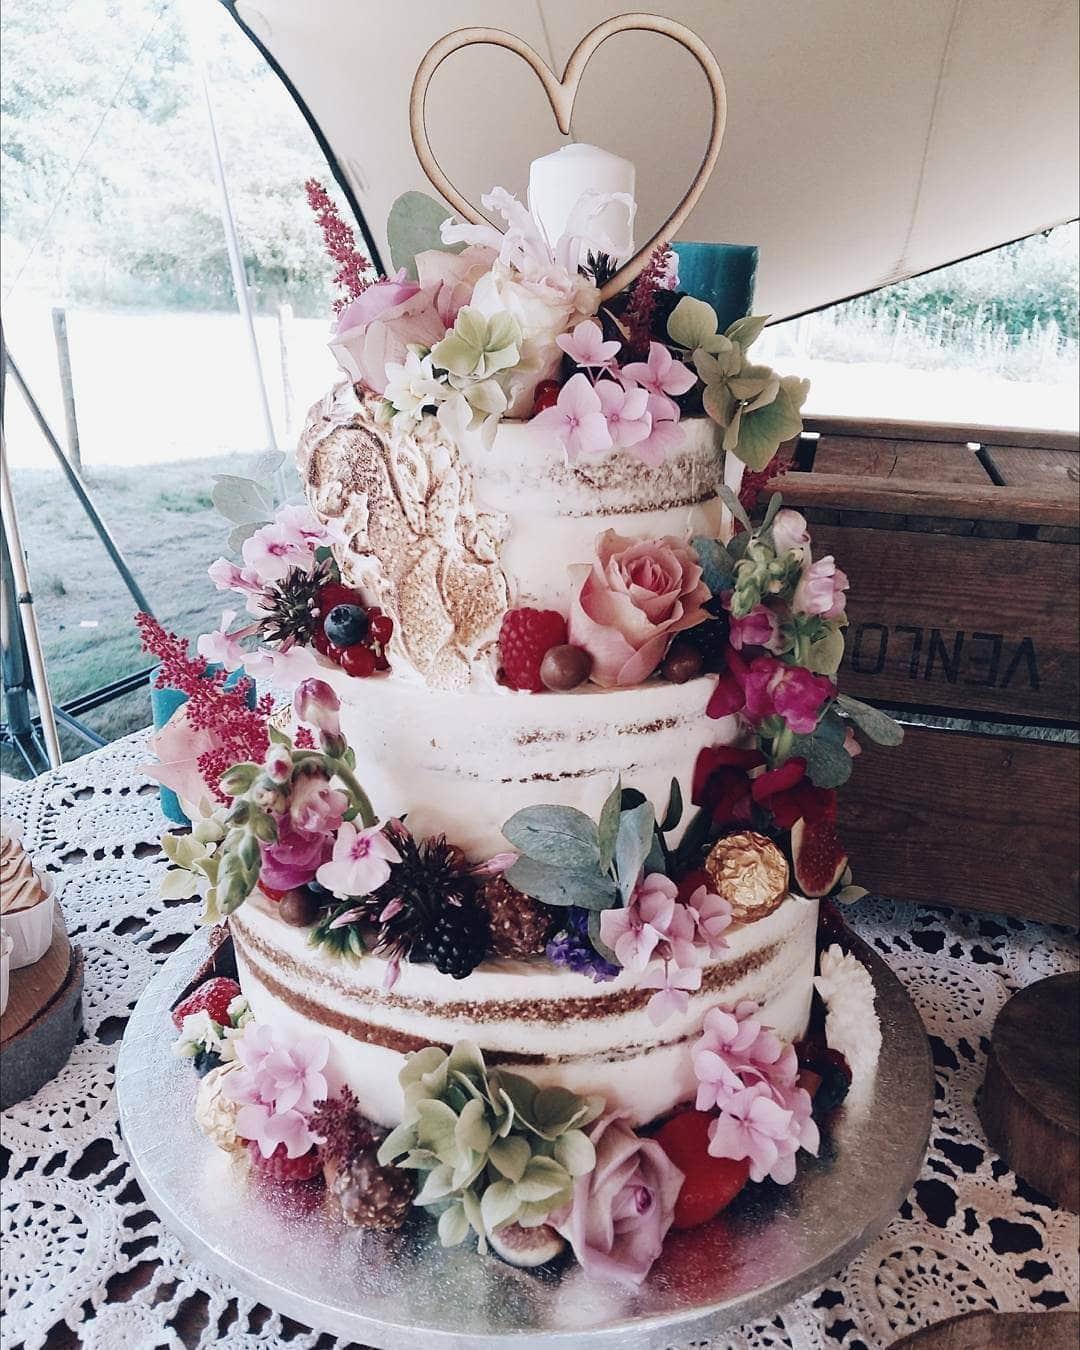 Life of Pie bruidstaart naked cake